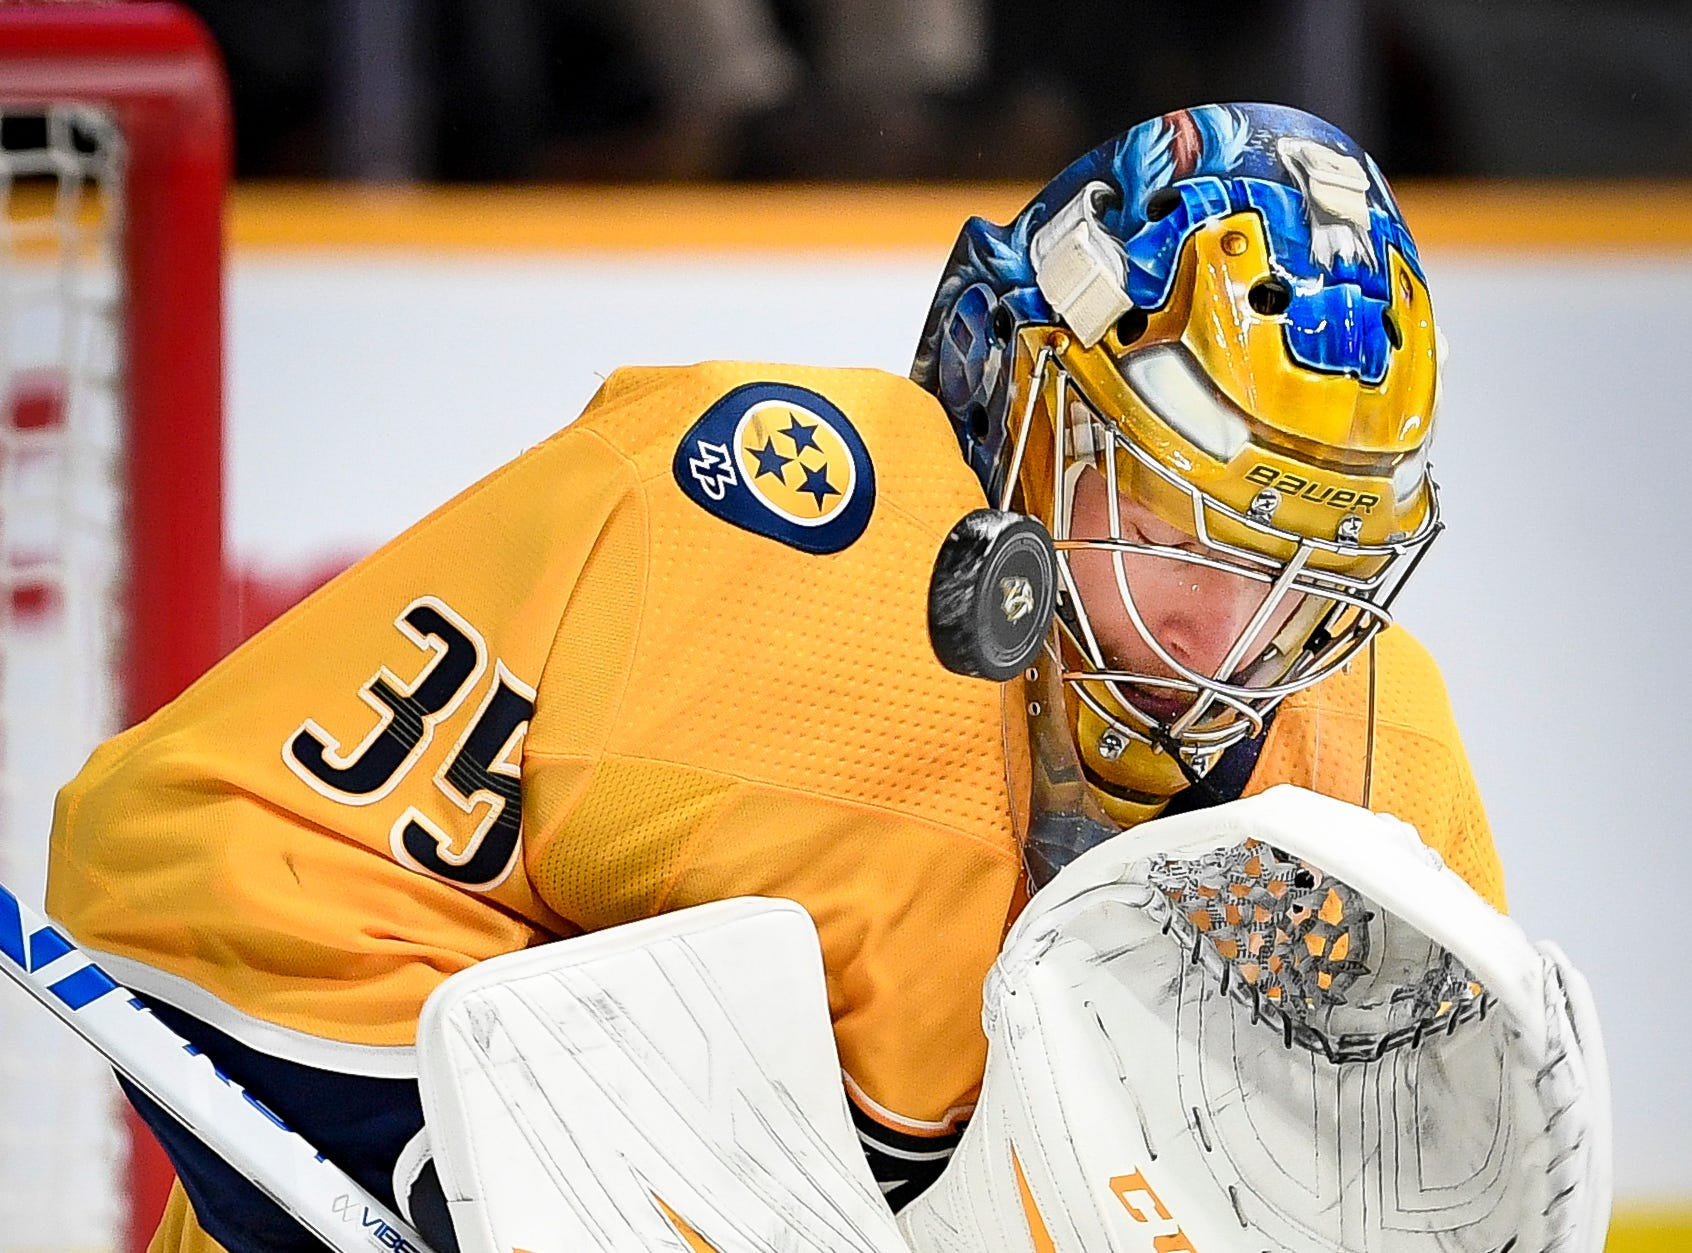 Nashville Predators goaltender Pekka Rinne (35) blocks a Colorado Avalanche shot during the second period at Bridgestone Arena in Nashville, Tenn., Tuesday, Nov. 27, 2018.